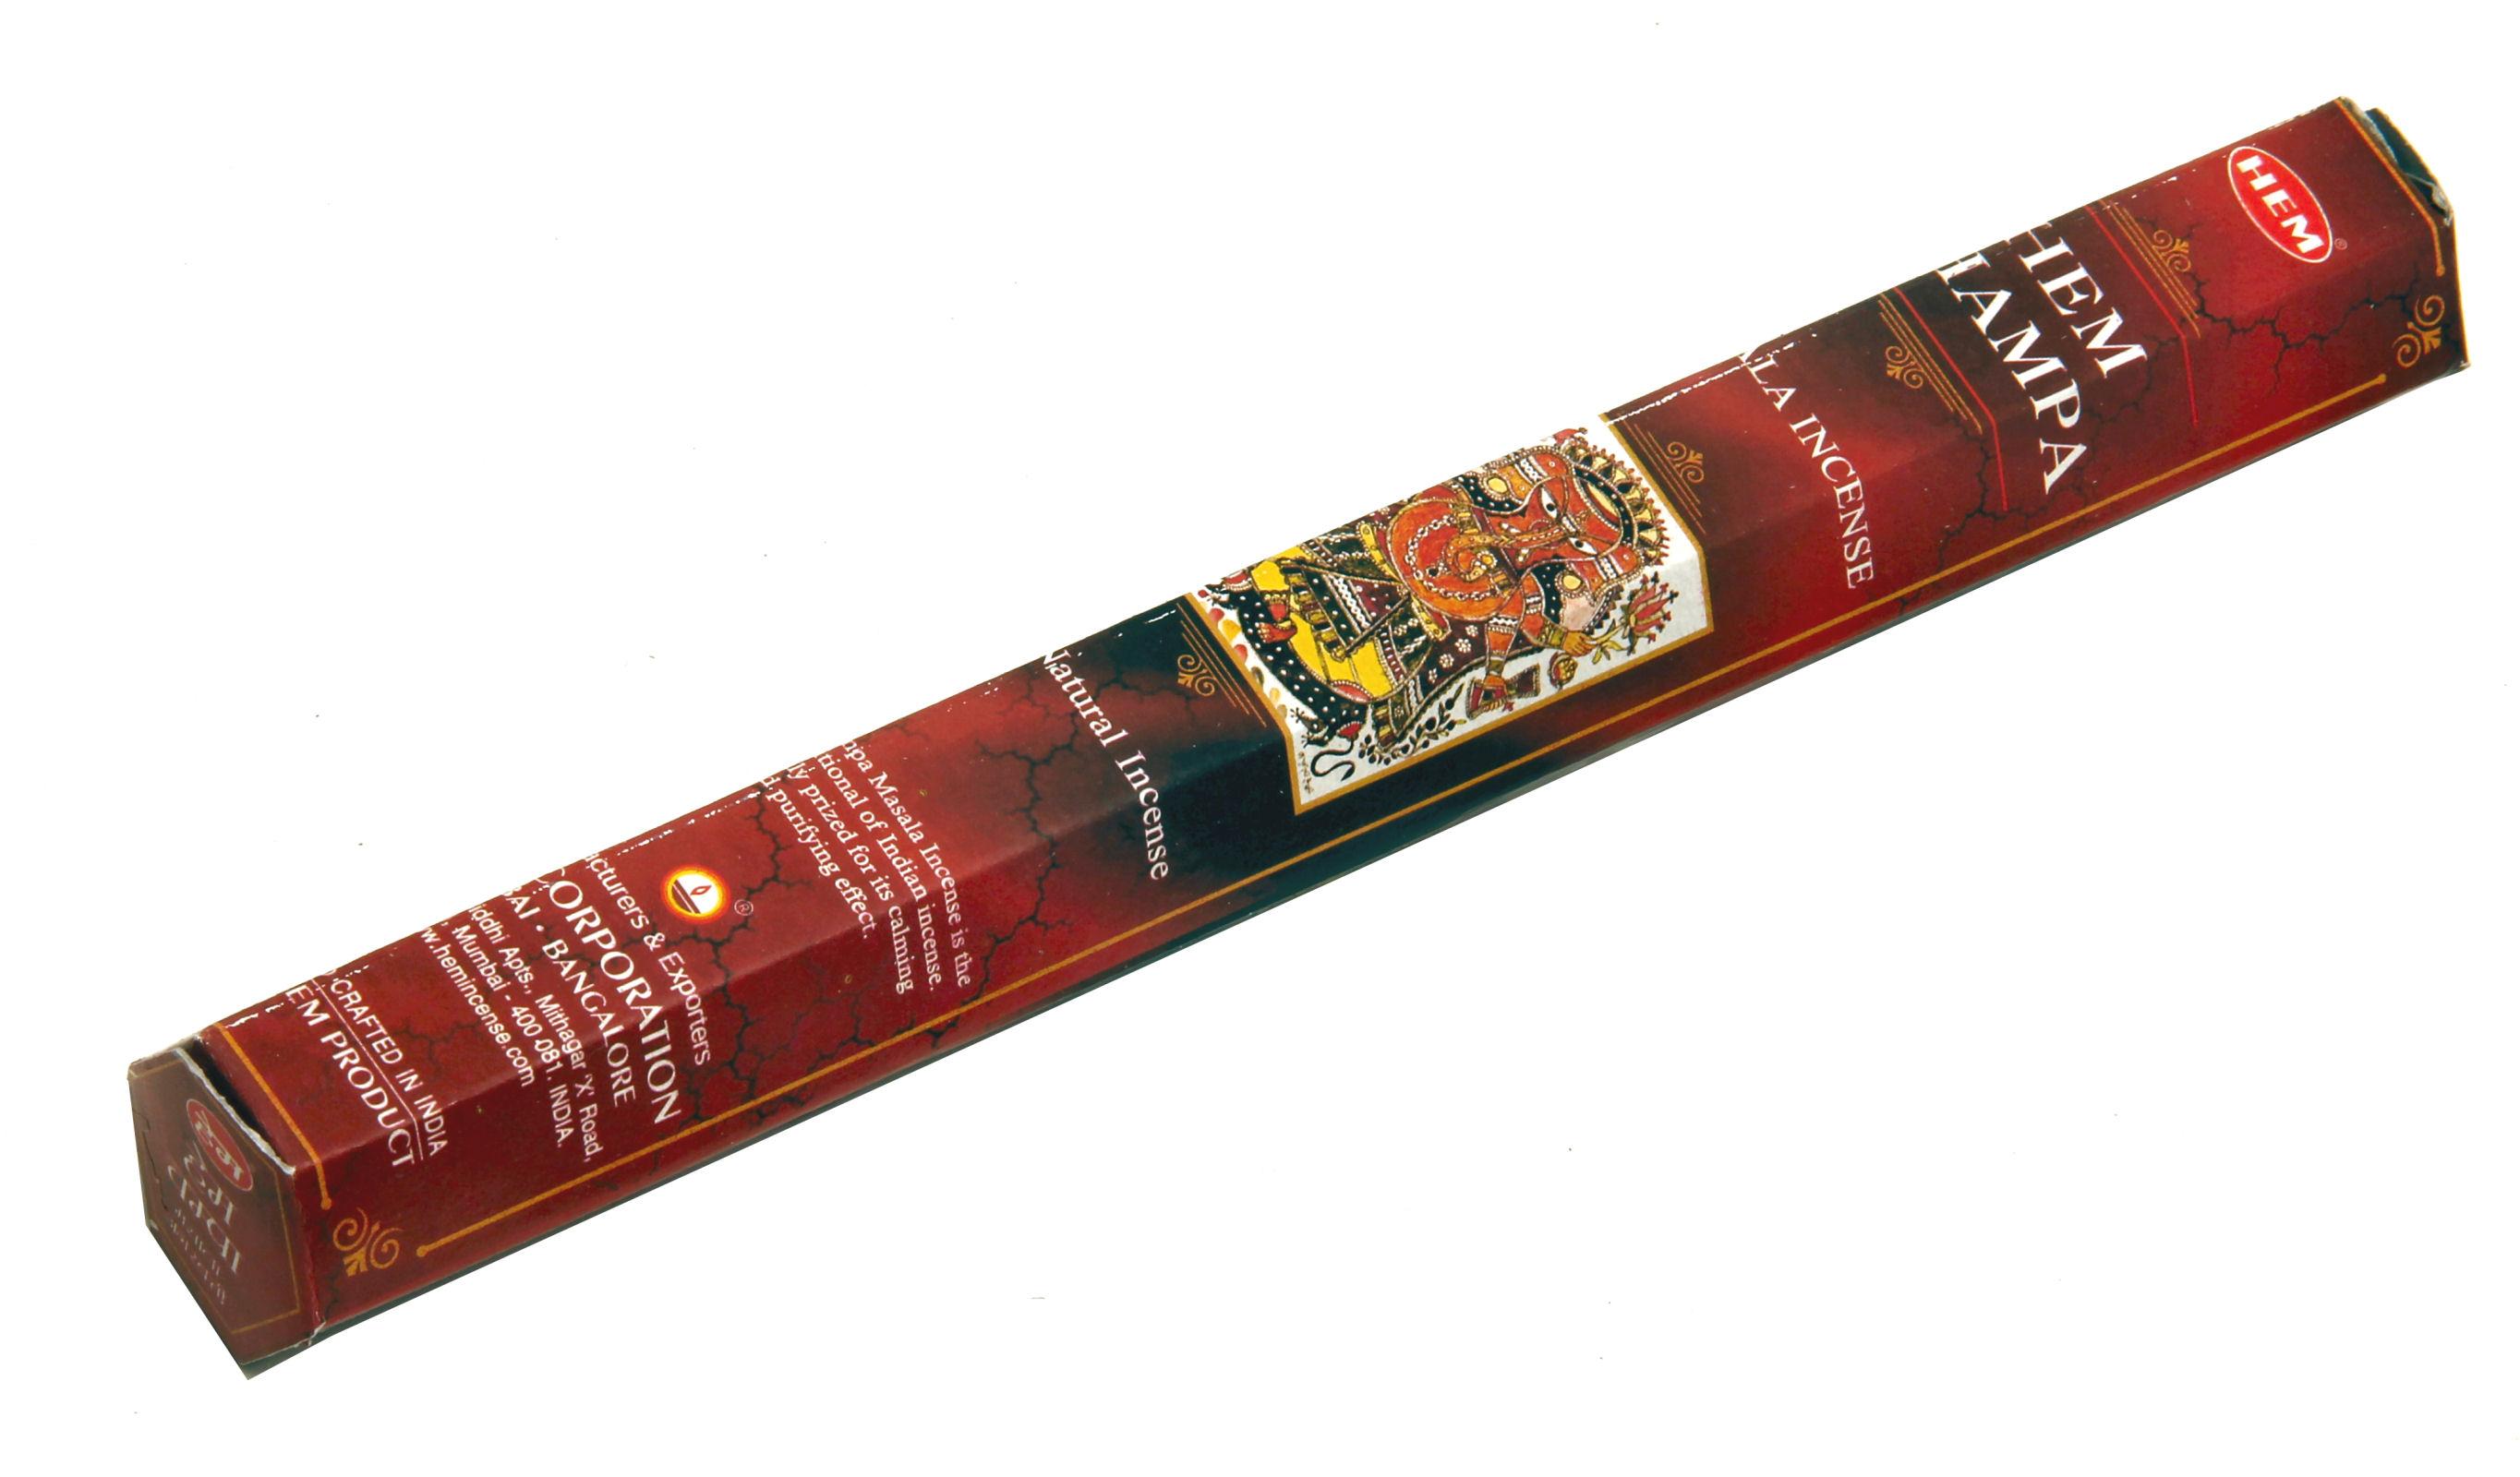 HEM Räucherstäbchen HEM Champa 15g Hexa Packung  Ca. 15 Incence Sticks